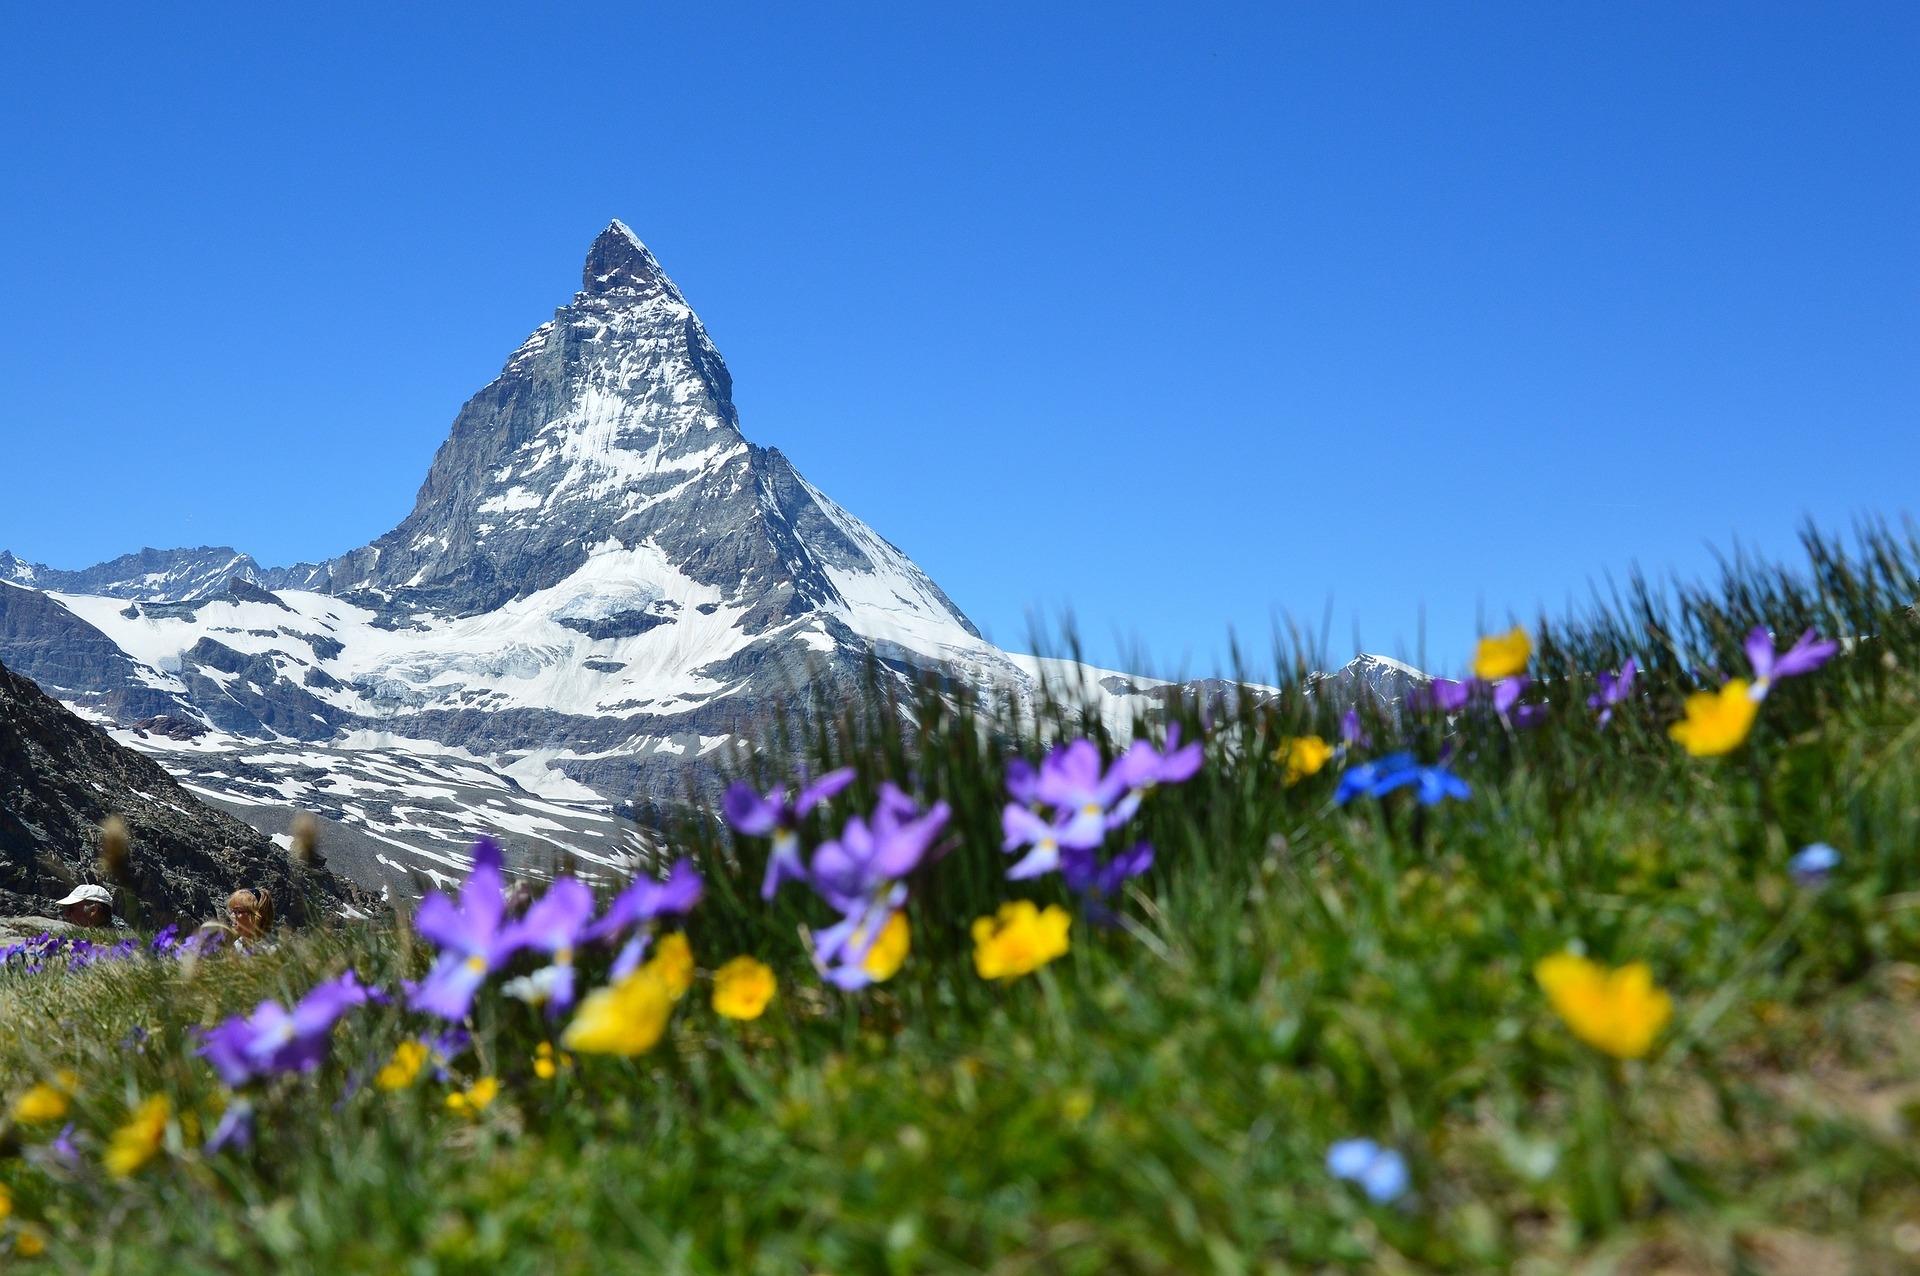 szwajcaria-zermatt-matterhorn